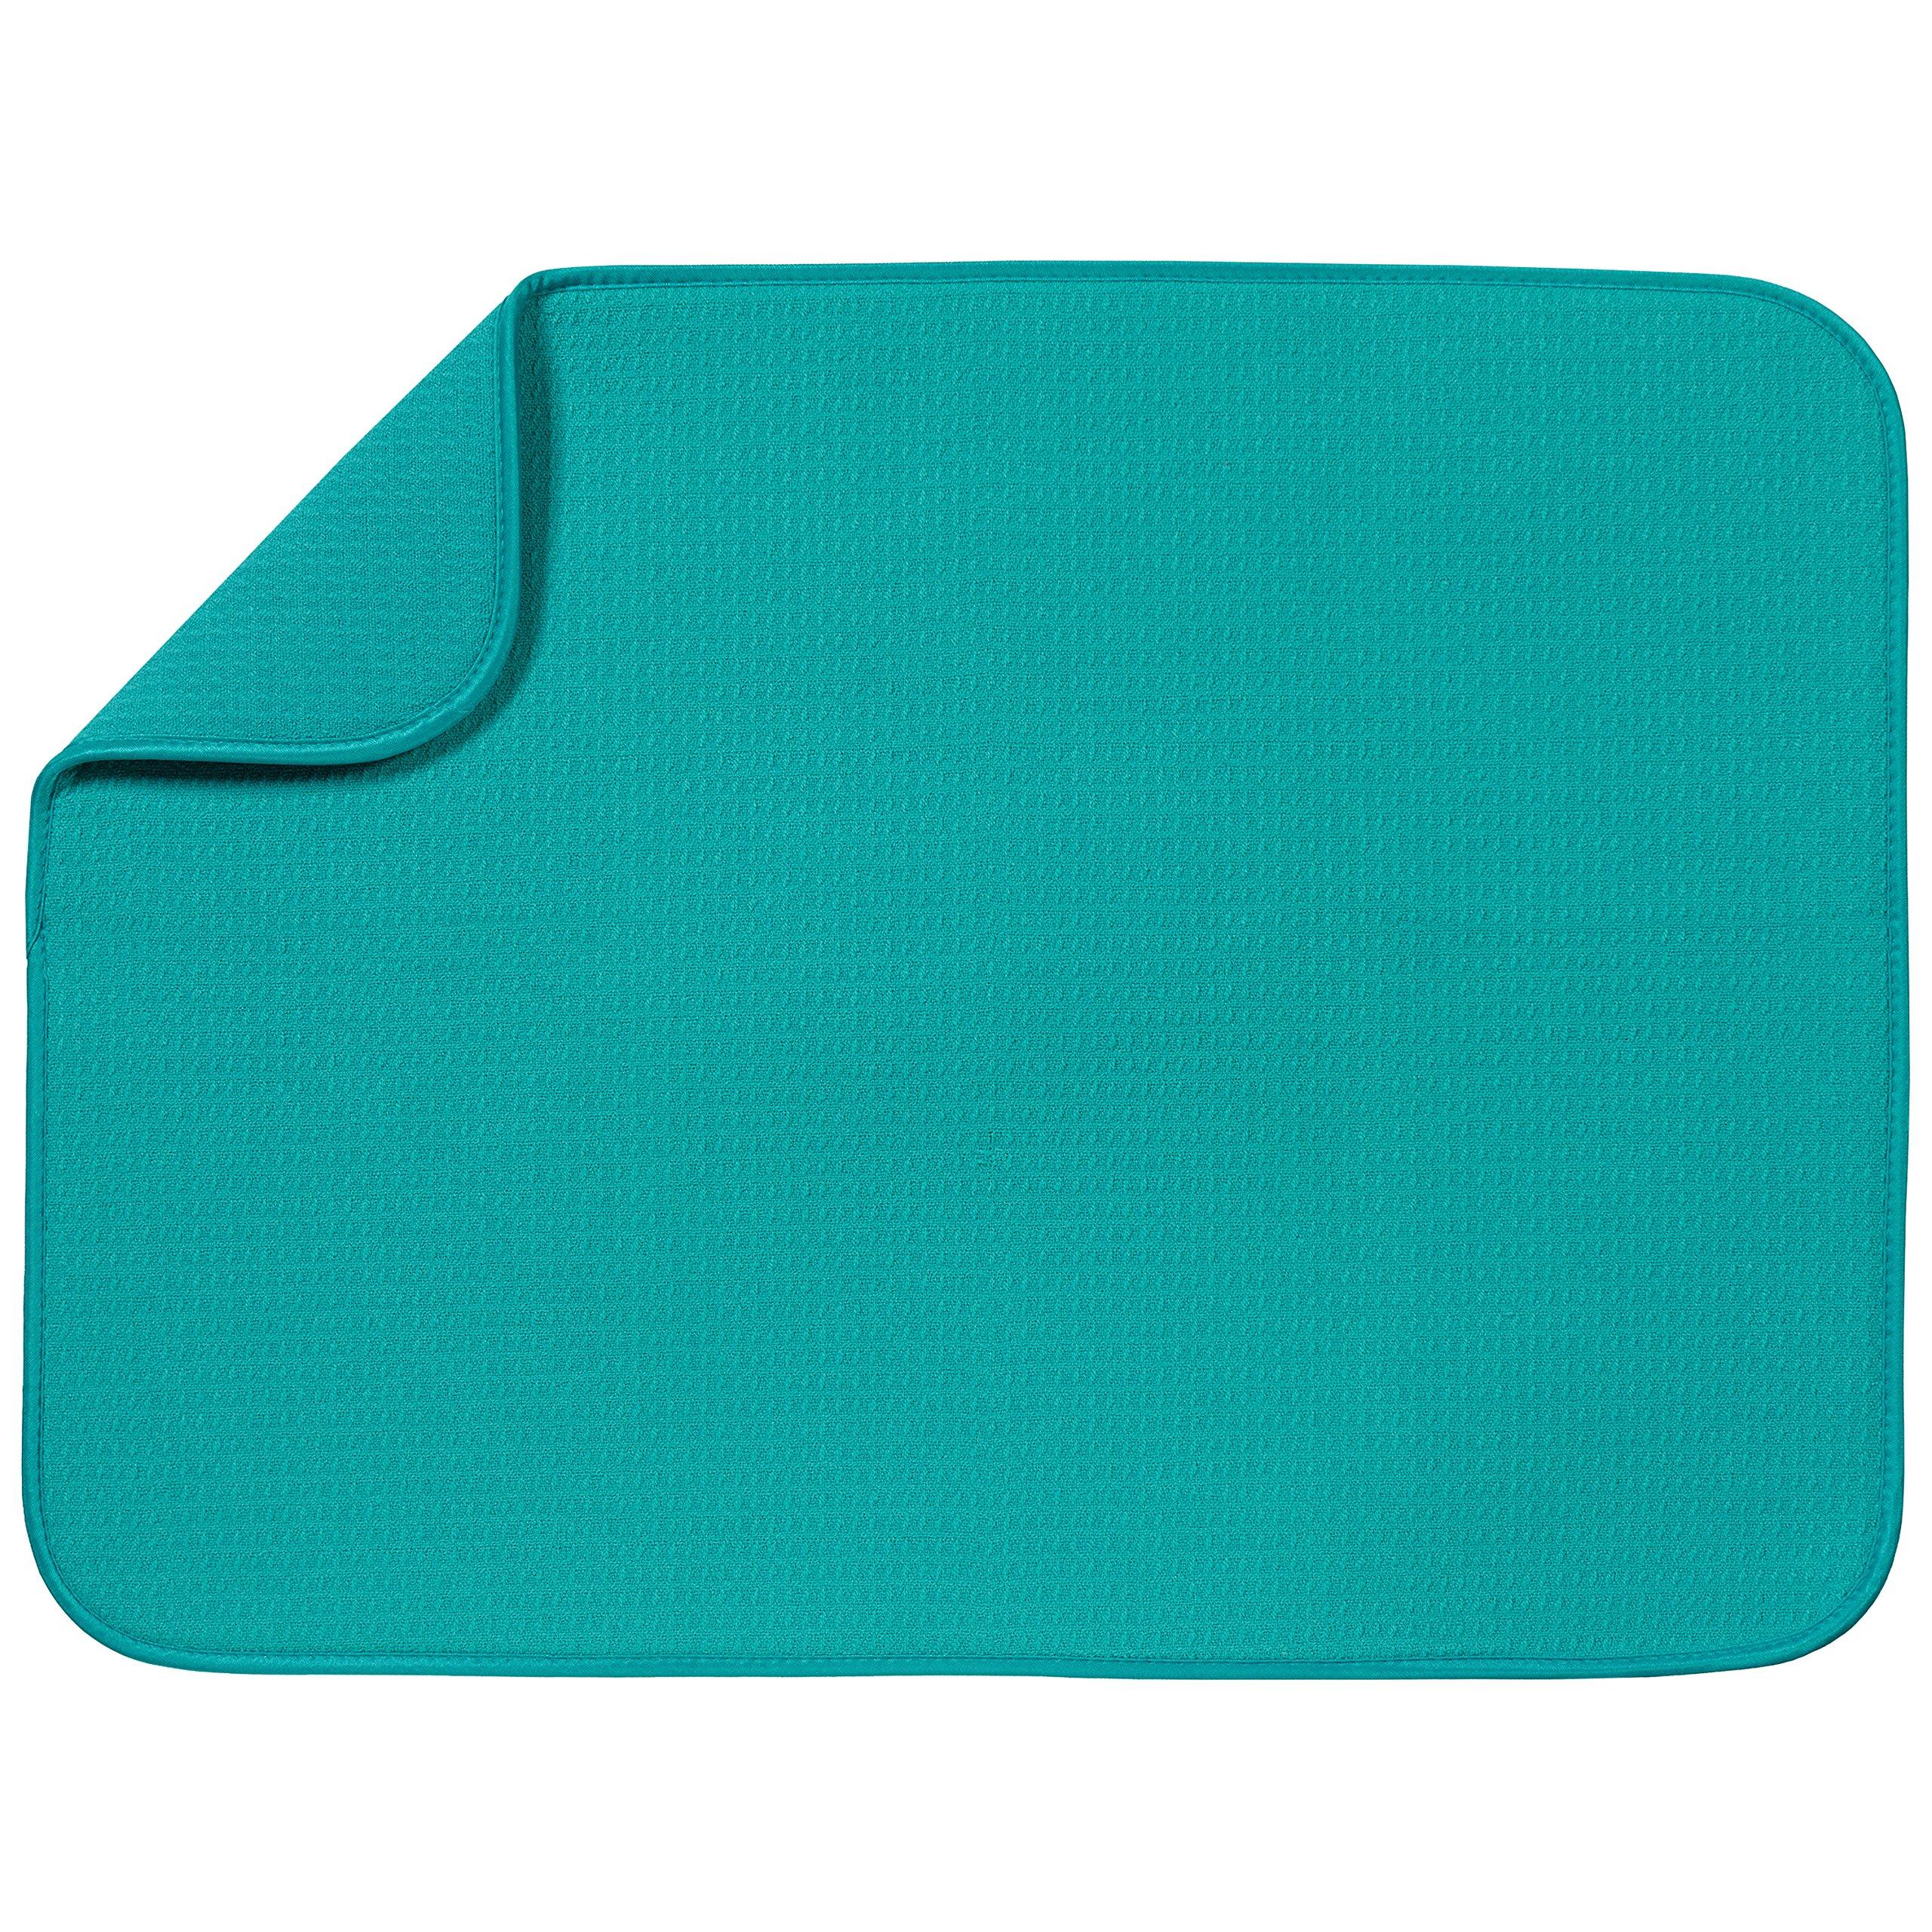 S&T XL Microfiber Dish Drying Mat, 18'' x 24'', Teal